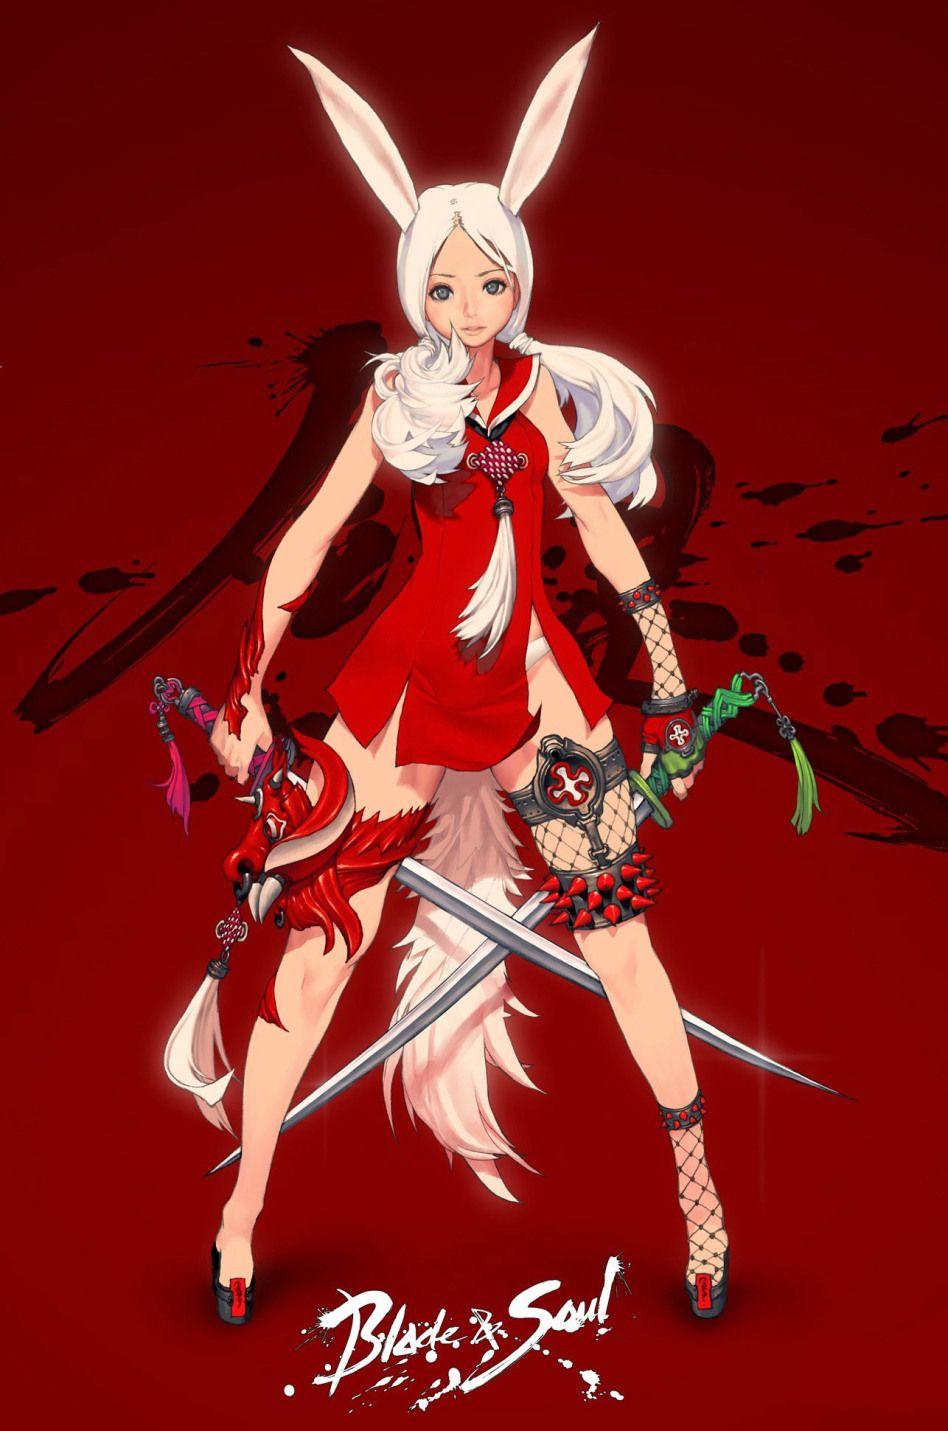 Blade & Soul Poster Anime Art(이미지 포함) 캐릭터 아트, 일본 애니메이션